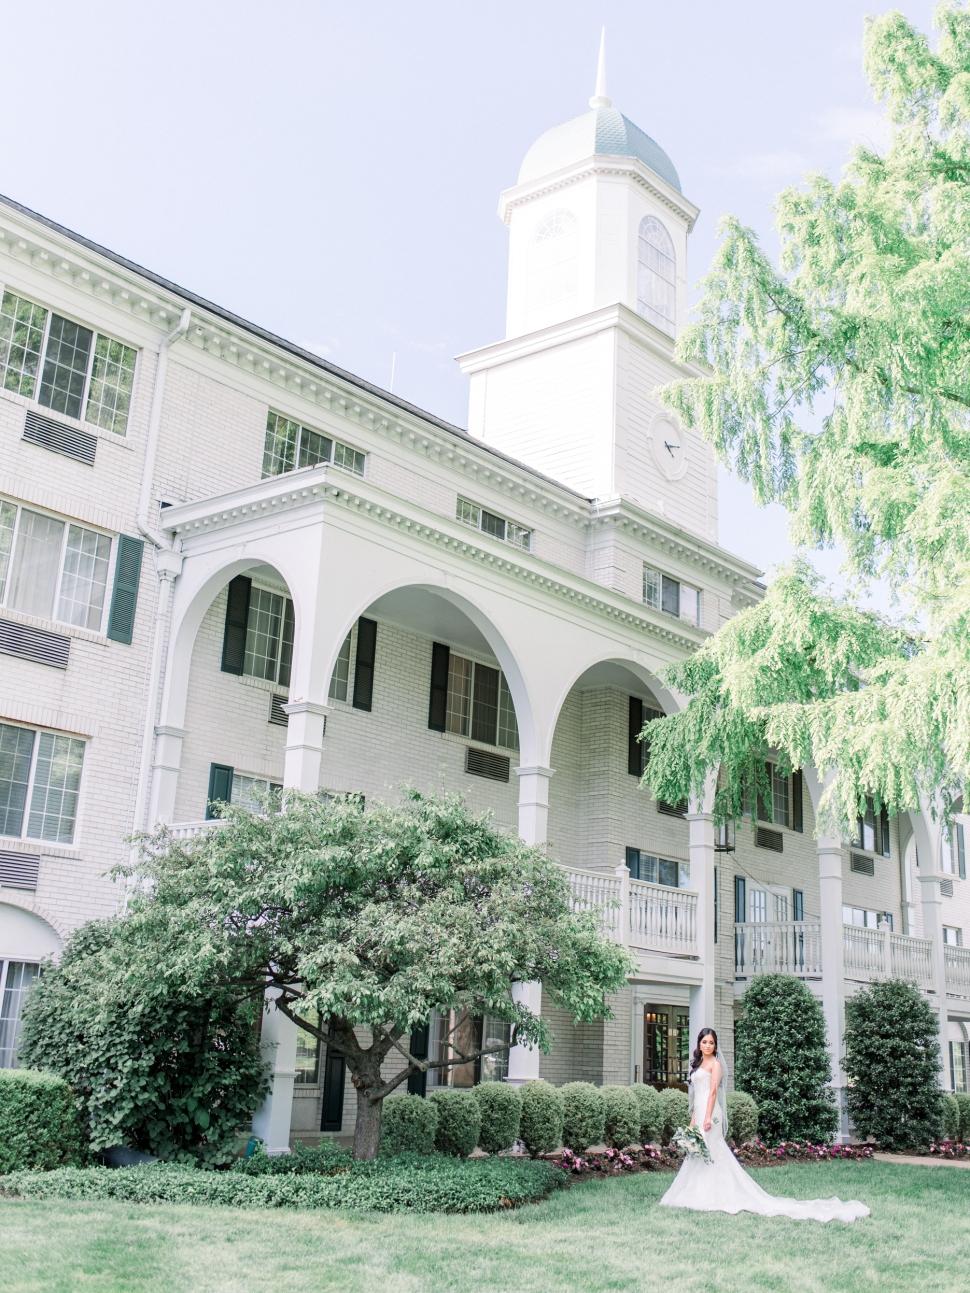 The-Madison-Hotel-Wedding-Photographer-Morristown-NJ-Photographer-Cassi-Claire_14.jpg